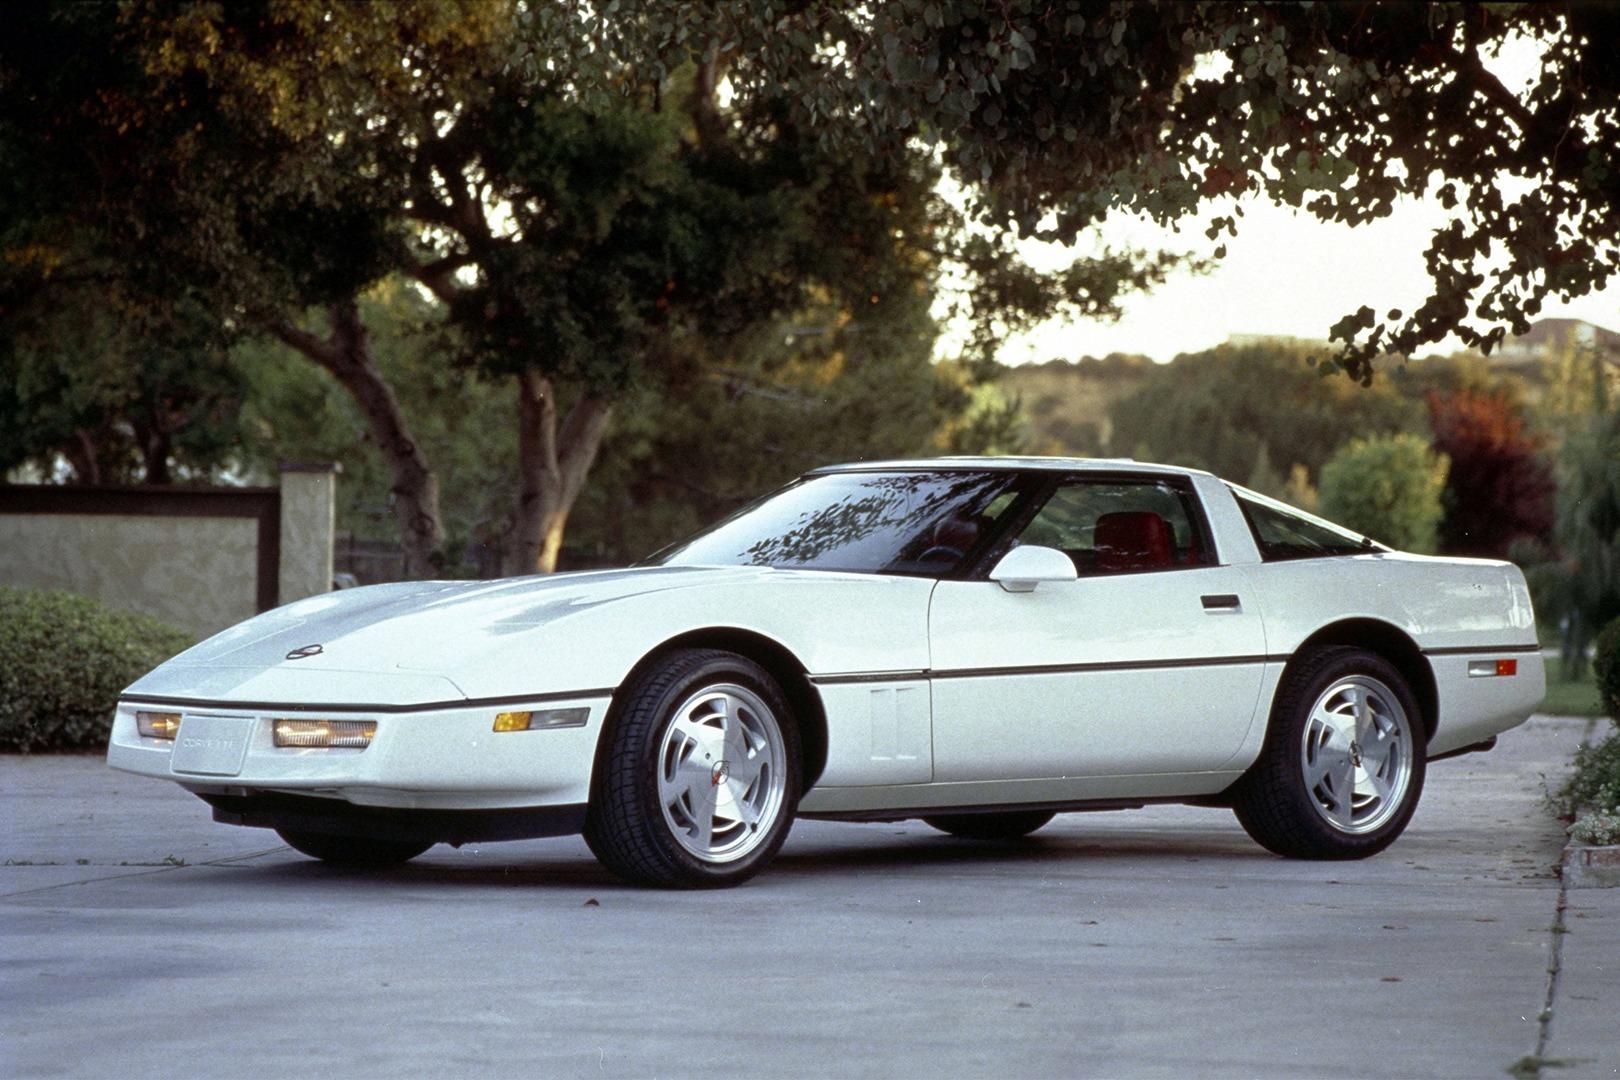 Westchester Corvette Club - Arroway chevrolet car show